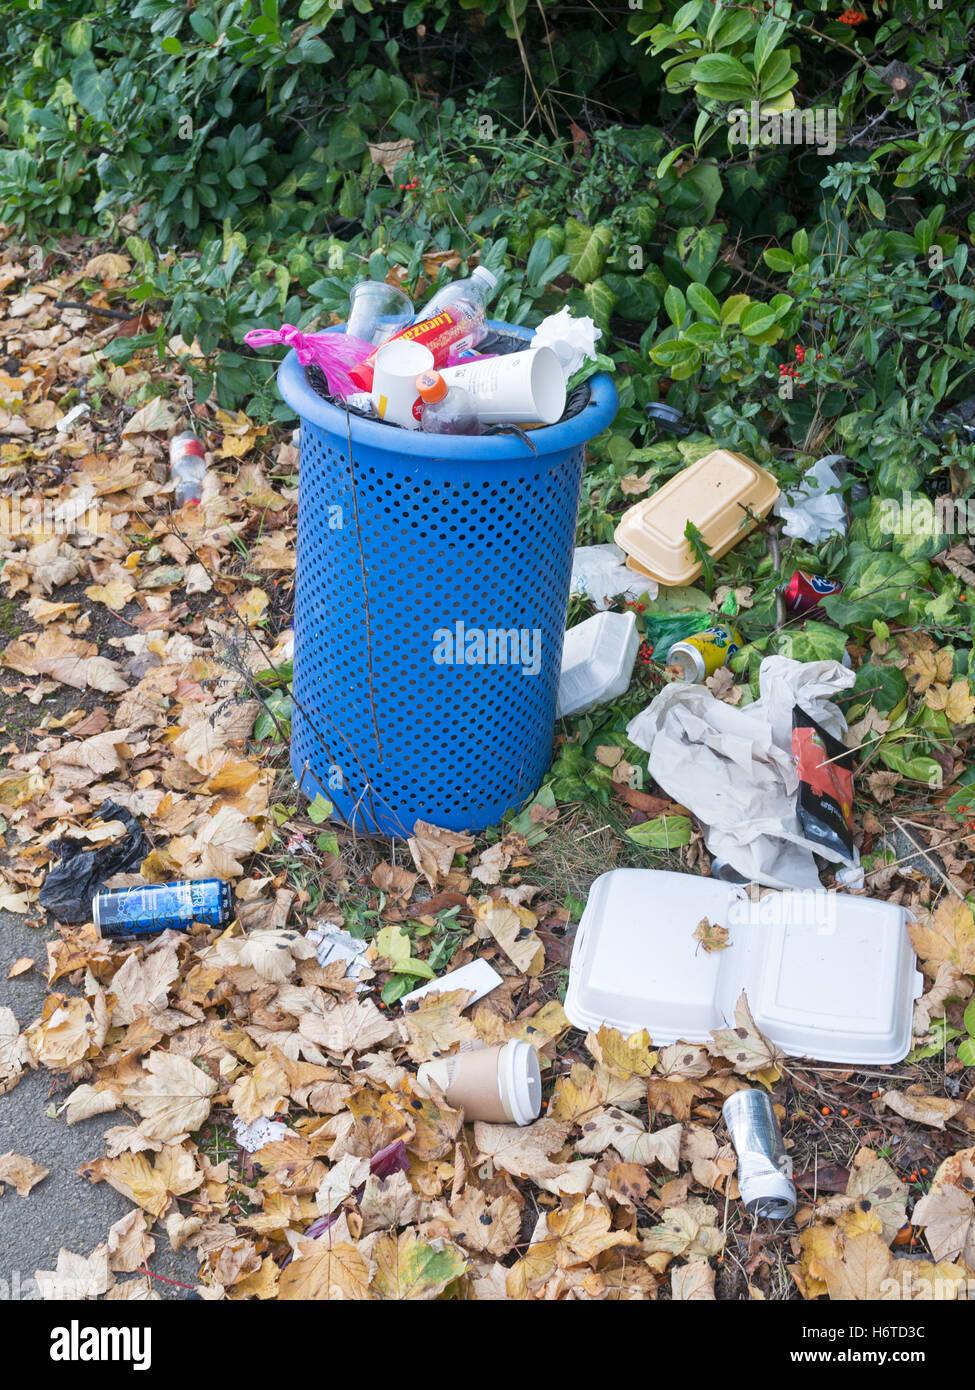 Overflowing litter bin, Sunderland, Tyne and Wear, England, UK Stock Photo